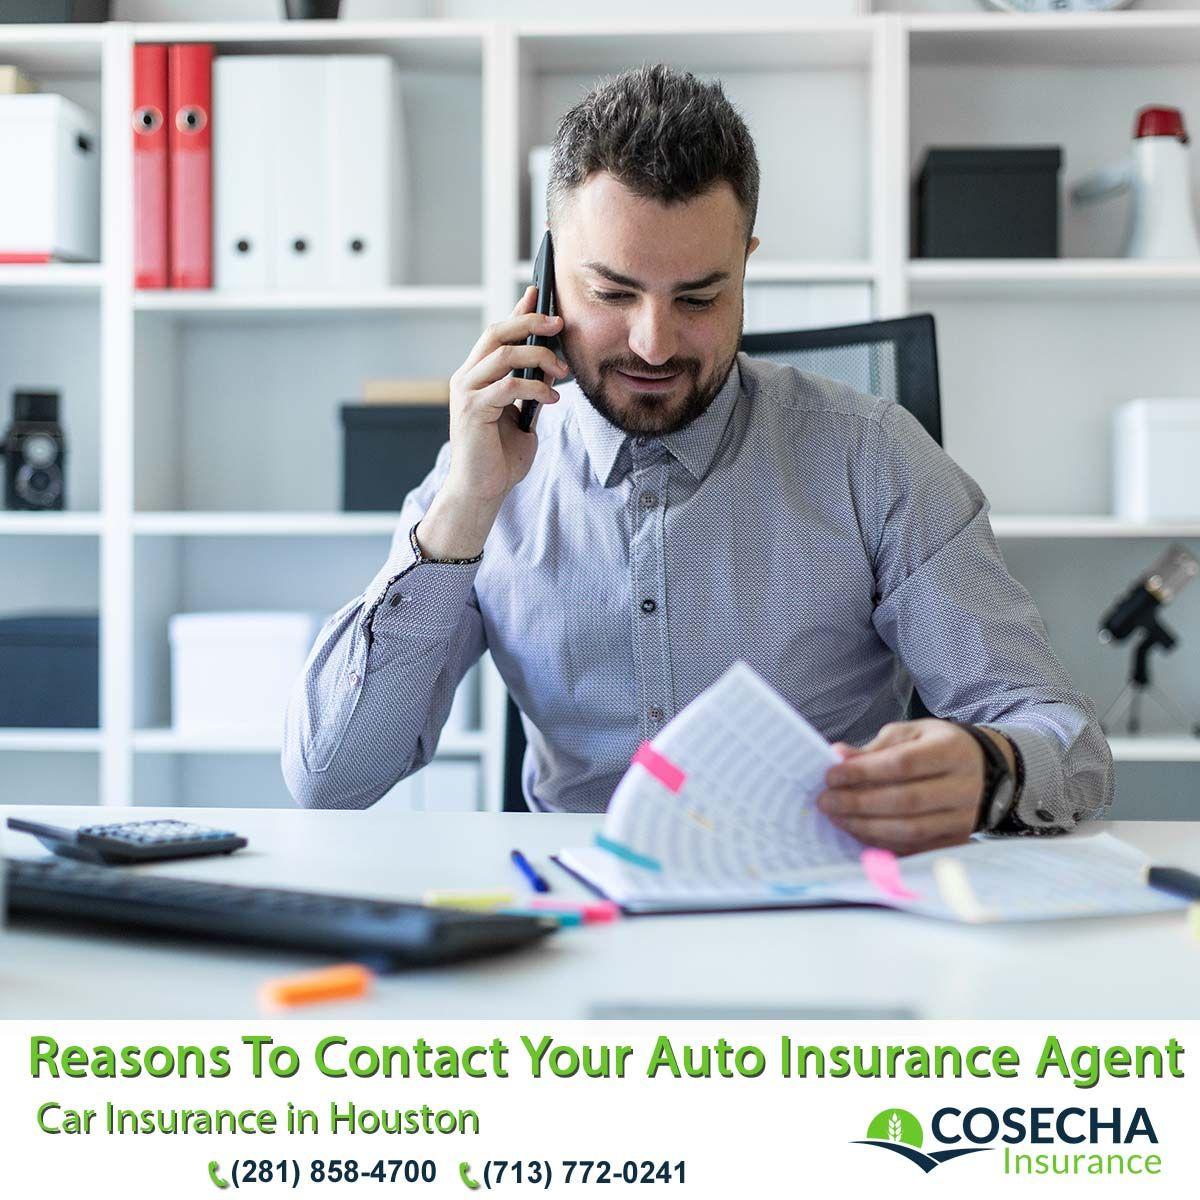 Pin By Cosecha Insurance On AUTO INSURANCE